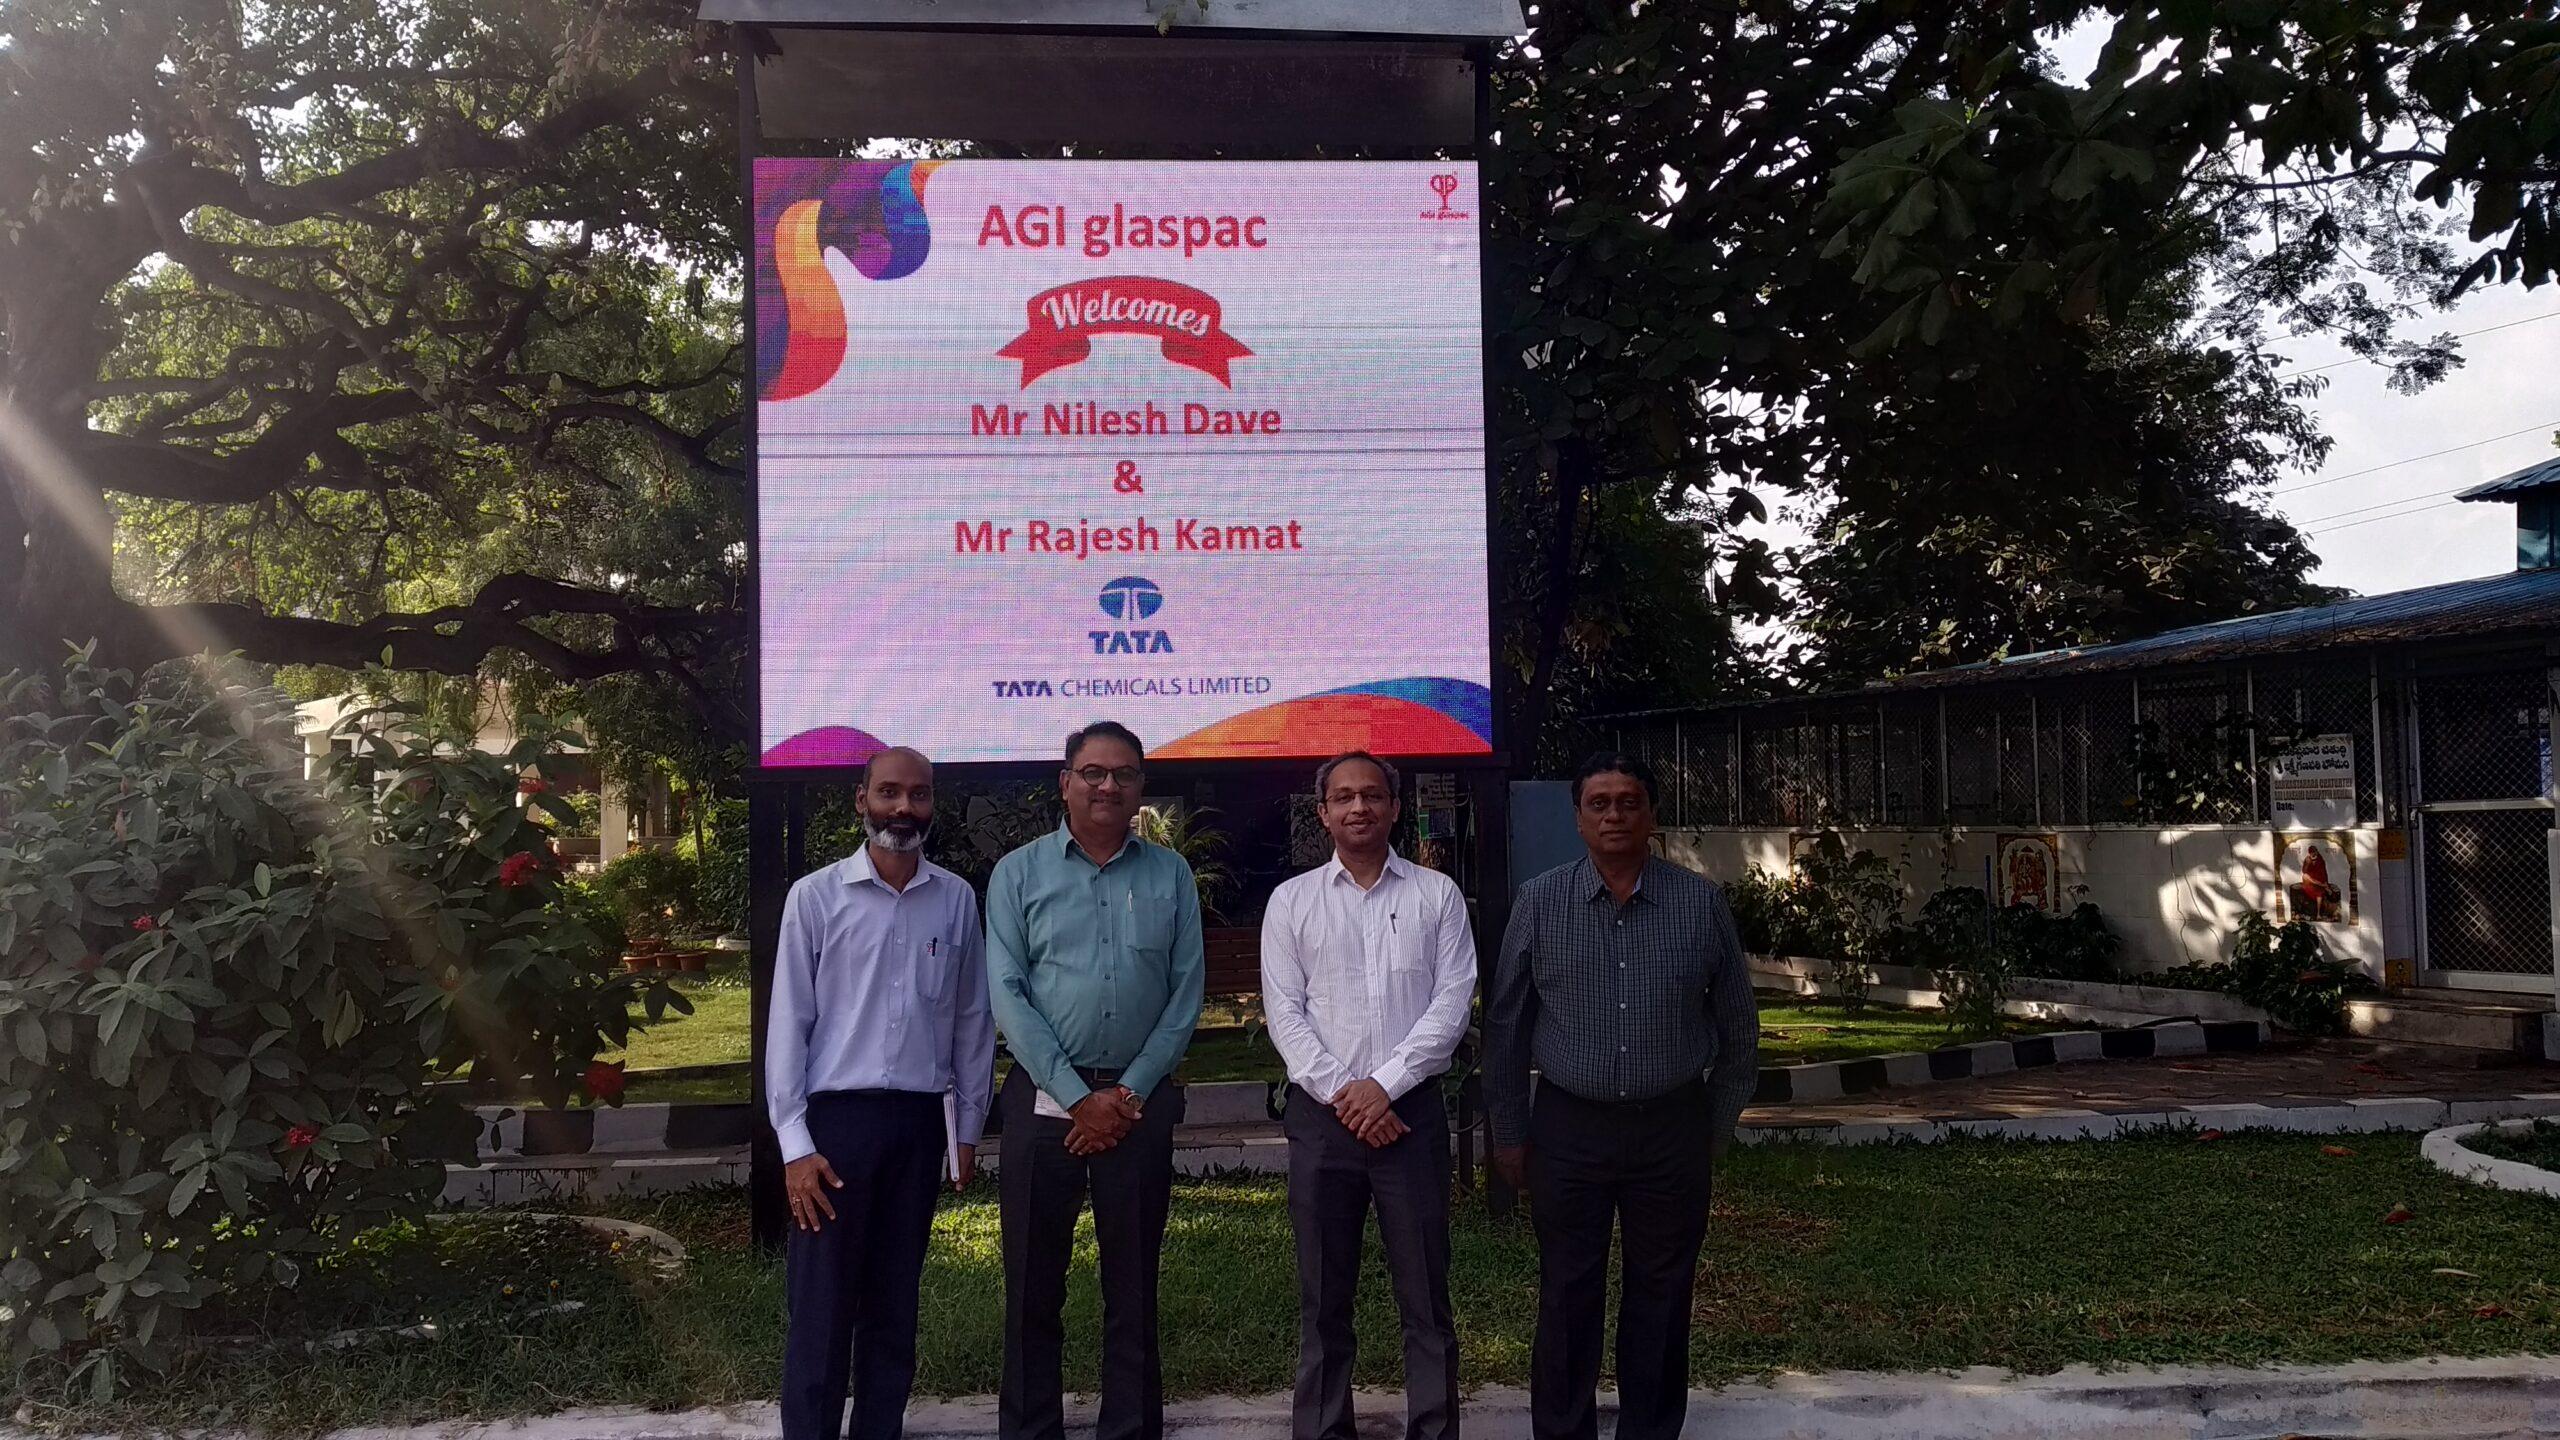 Mr. Nilesh Dave And Mr. Rajesh Kamat From Tata Chemicals